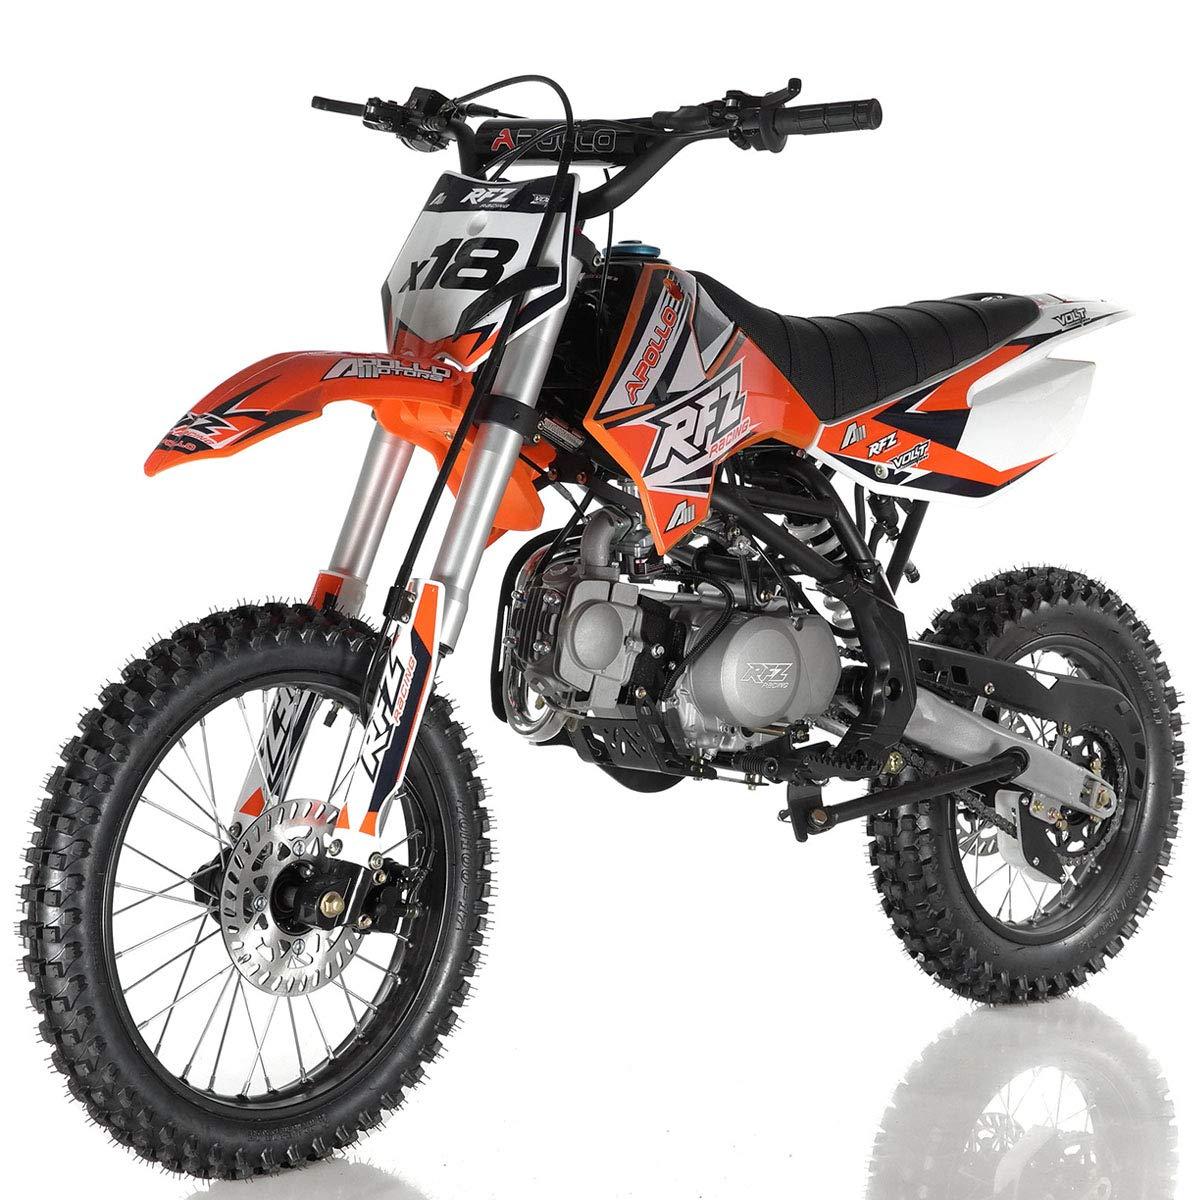 Amazon.com: 125 cc Dirt Bike Pit Bike Adultos Dirtbikes ...